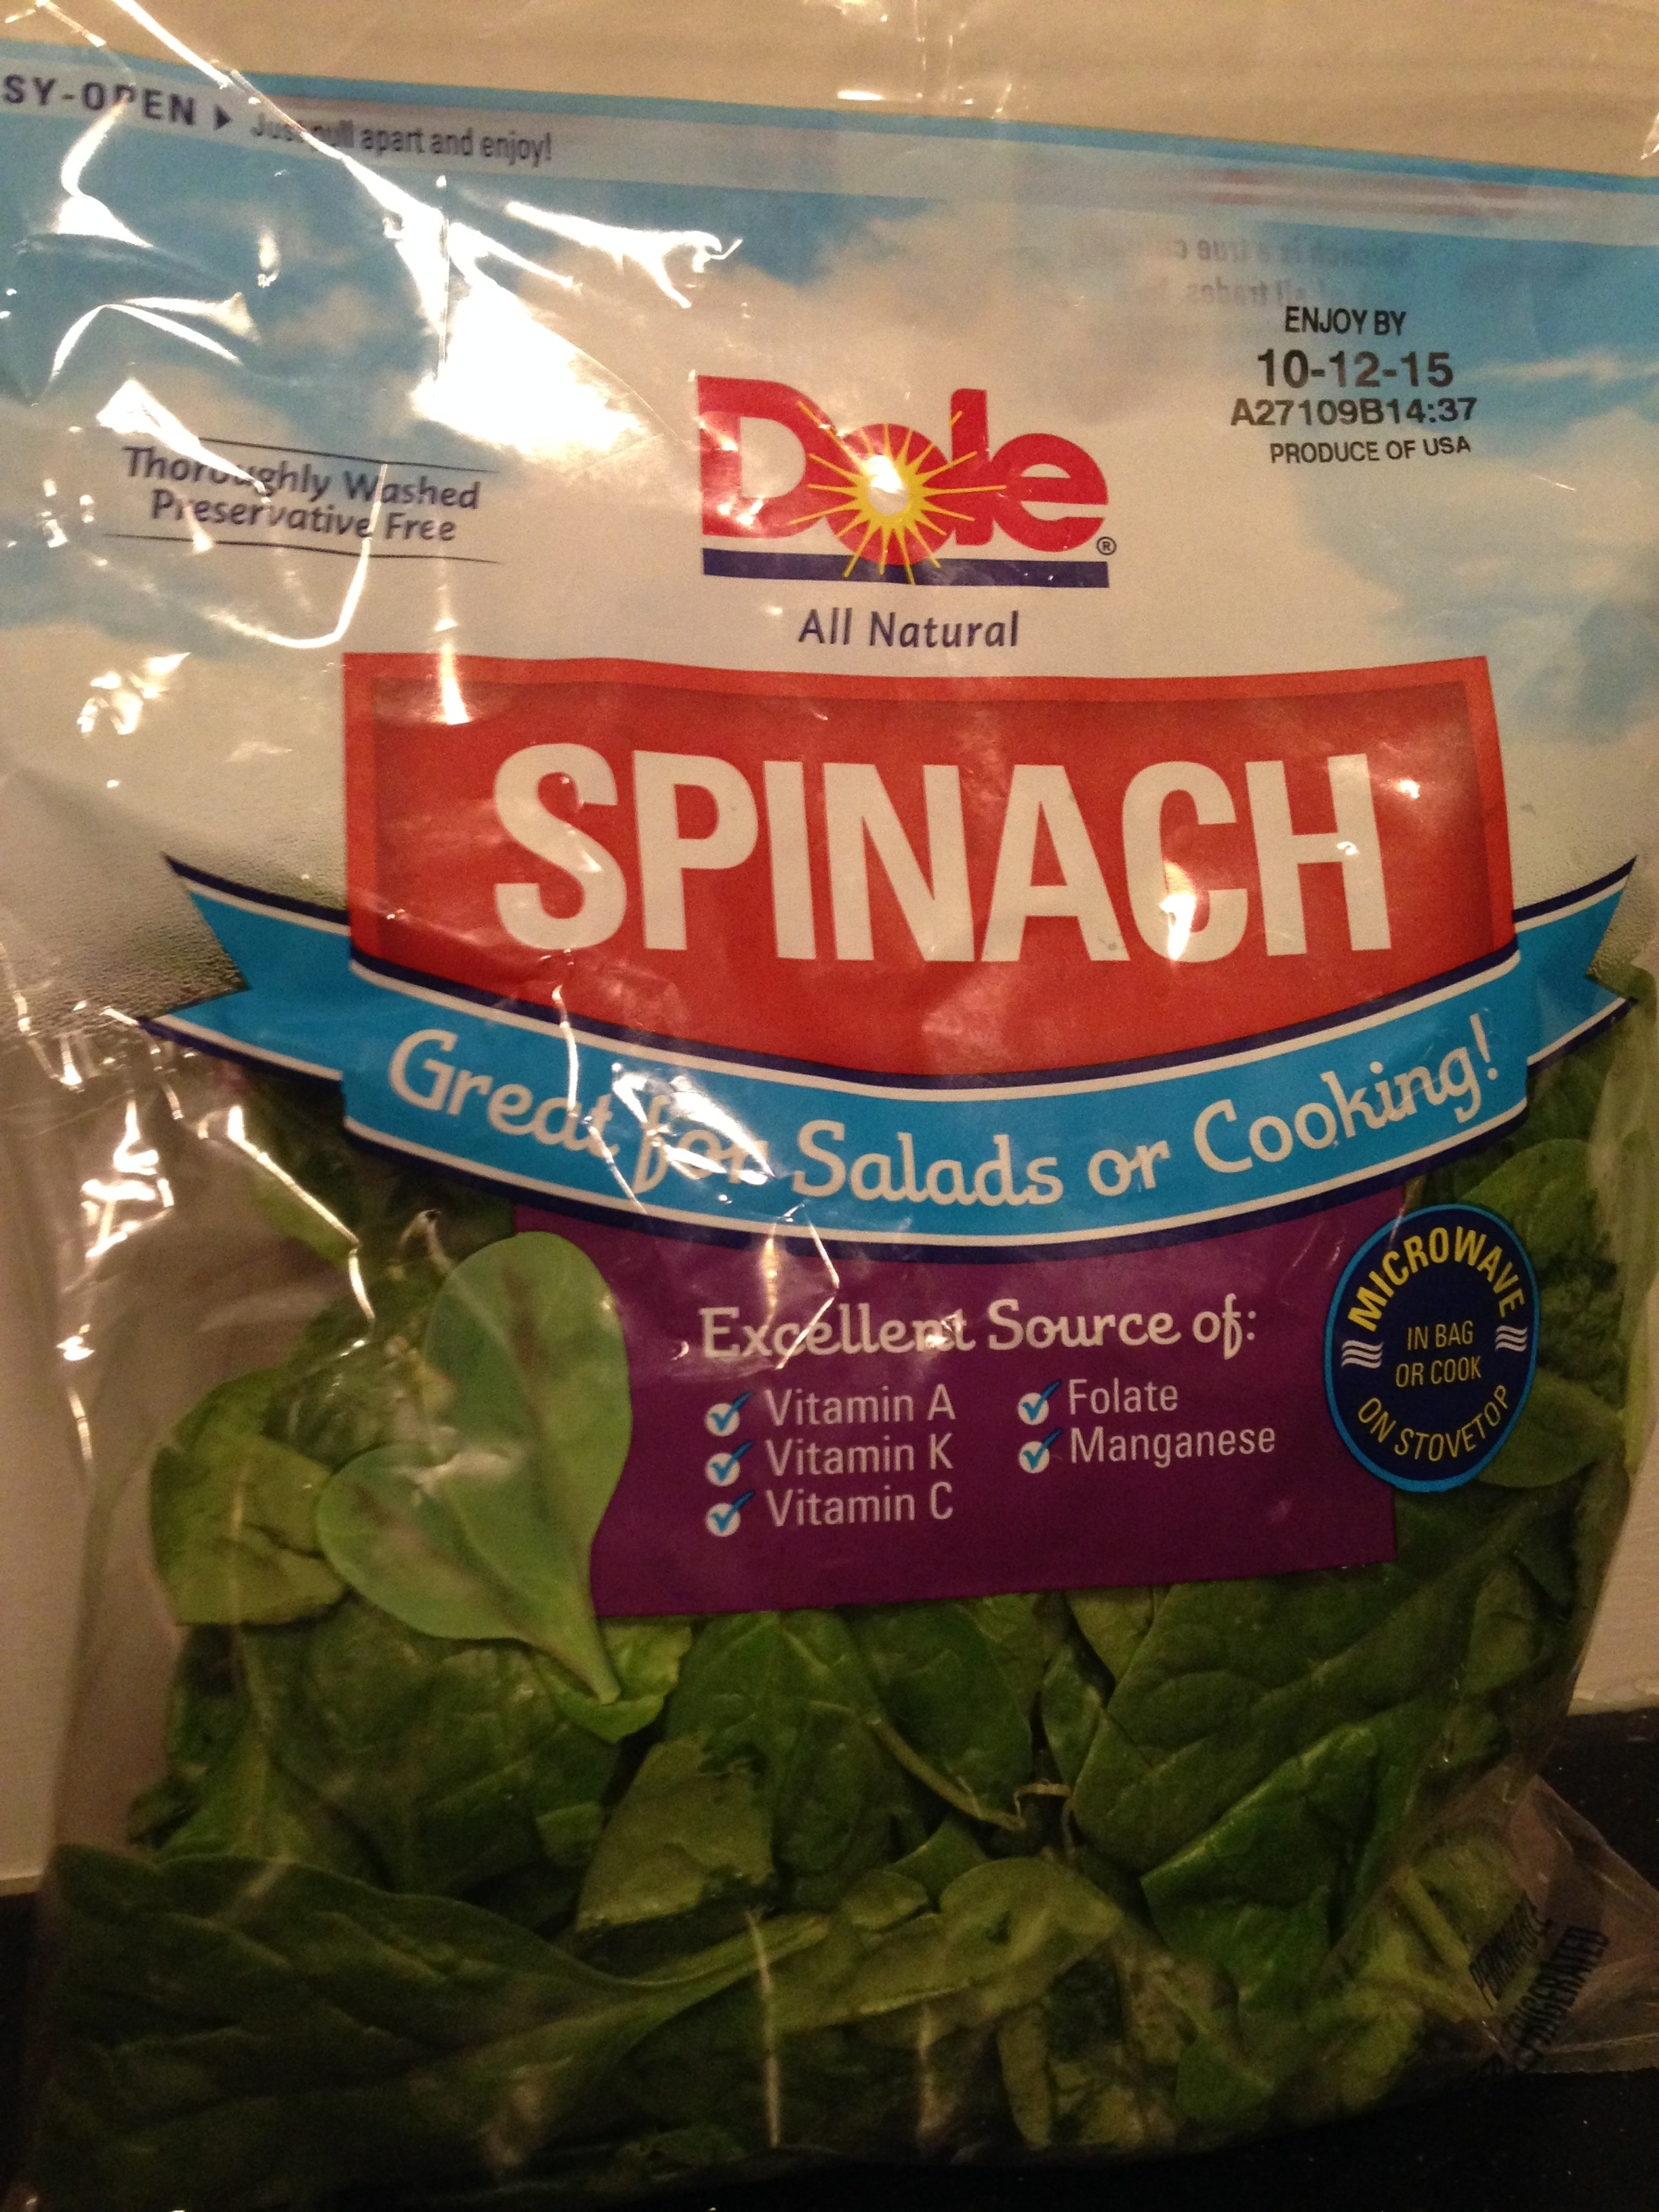 111a55eed6bf217fb21e_611a3f328ec8b5d1d138_spinach.JPG